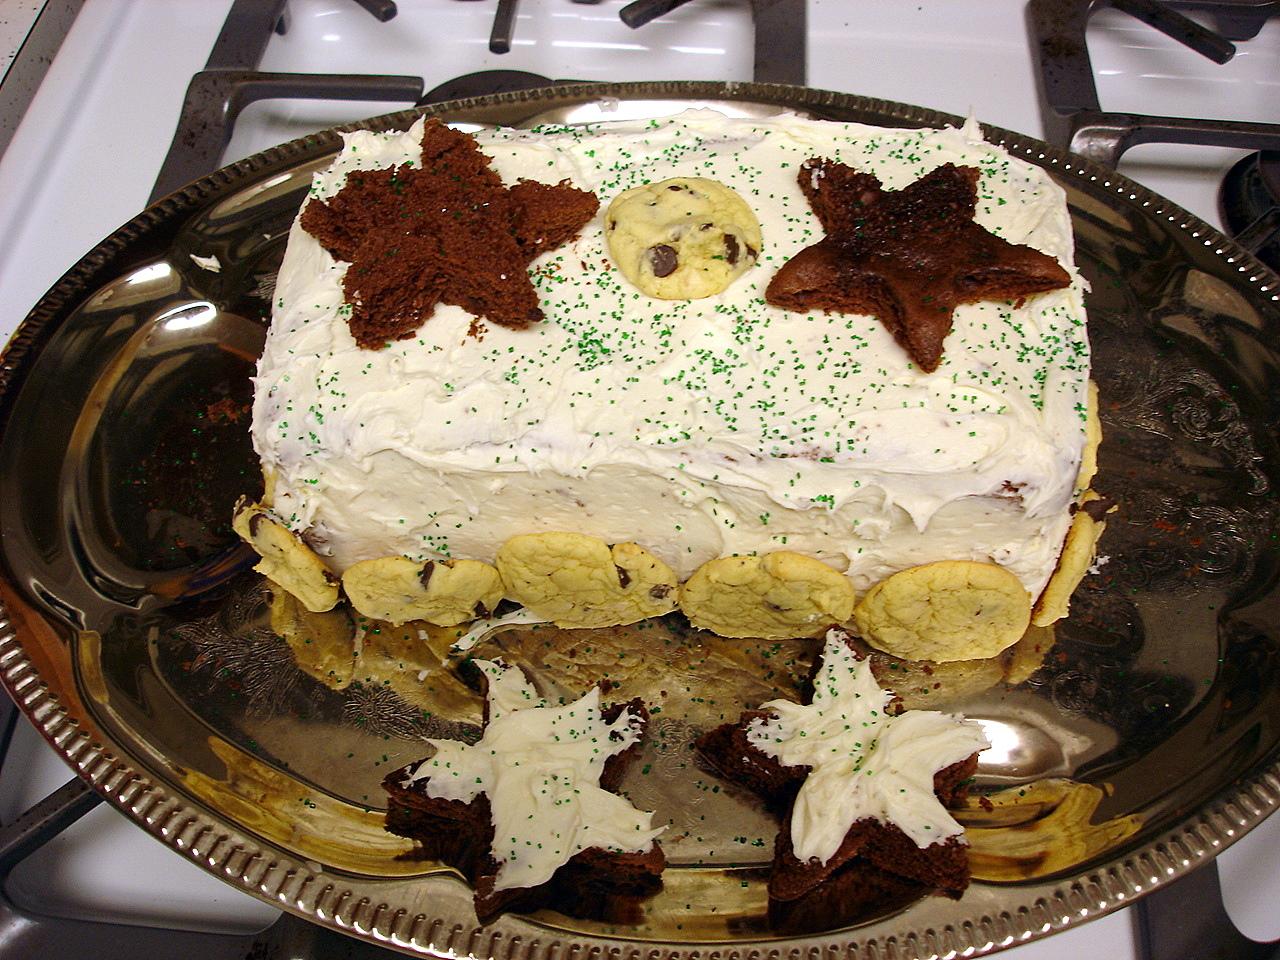 Sprinkle Decorated Square Cake